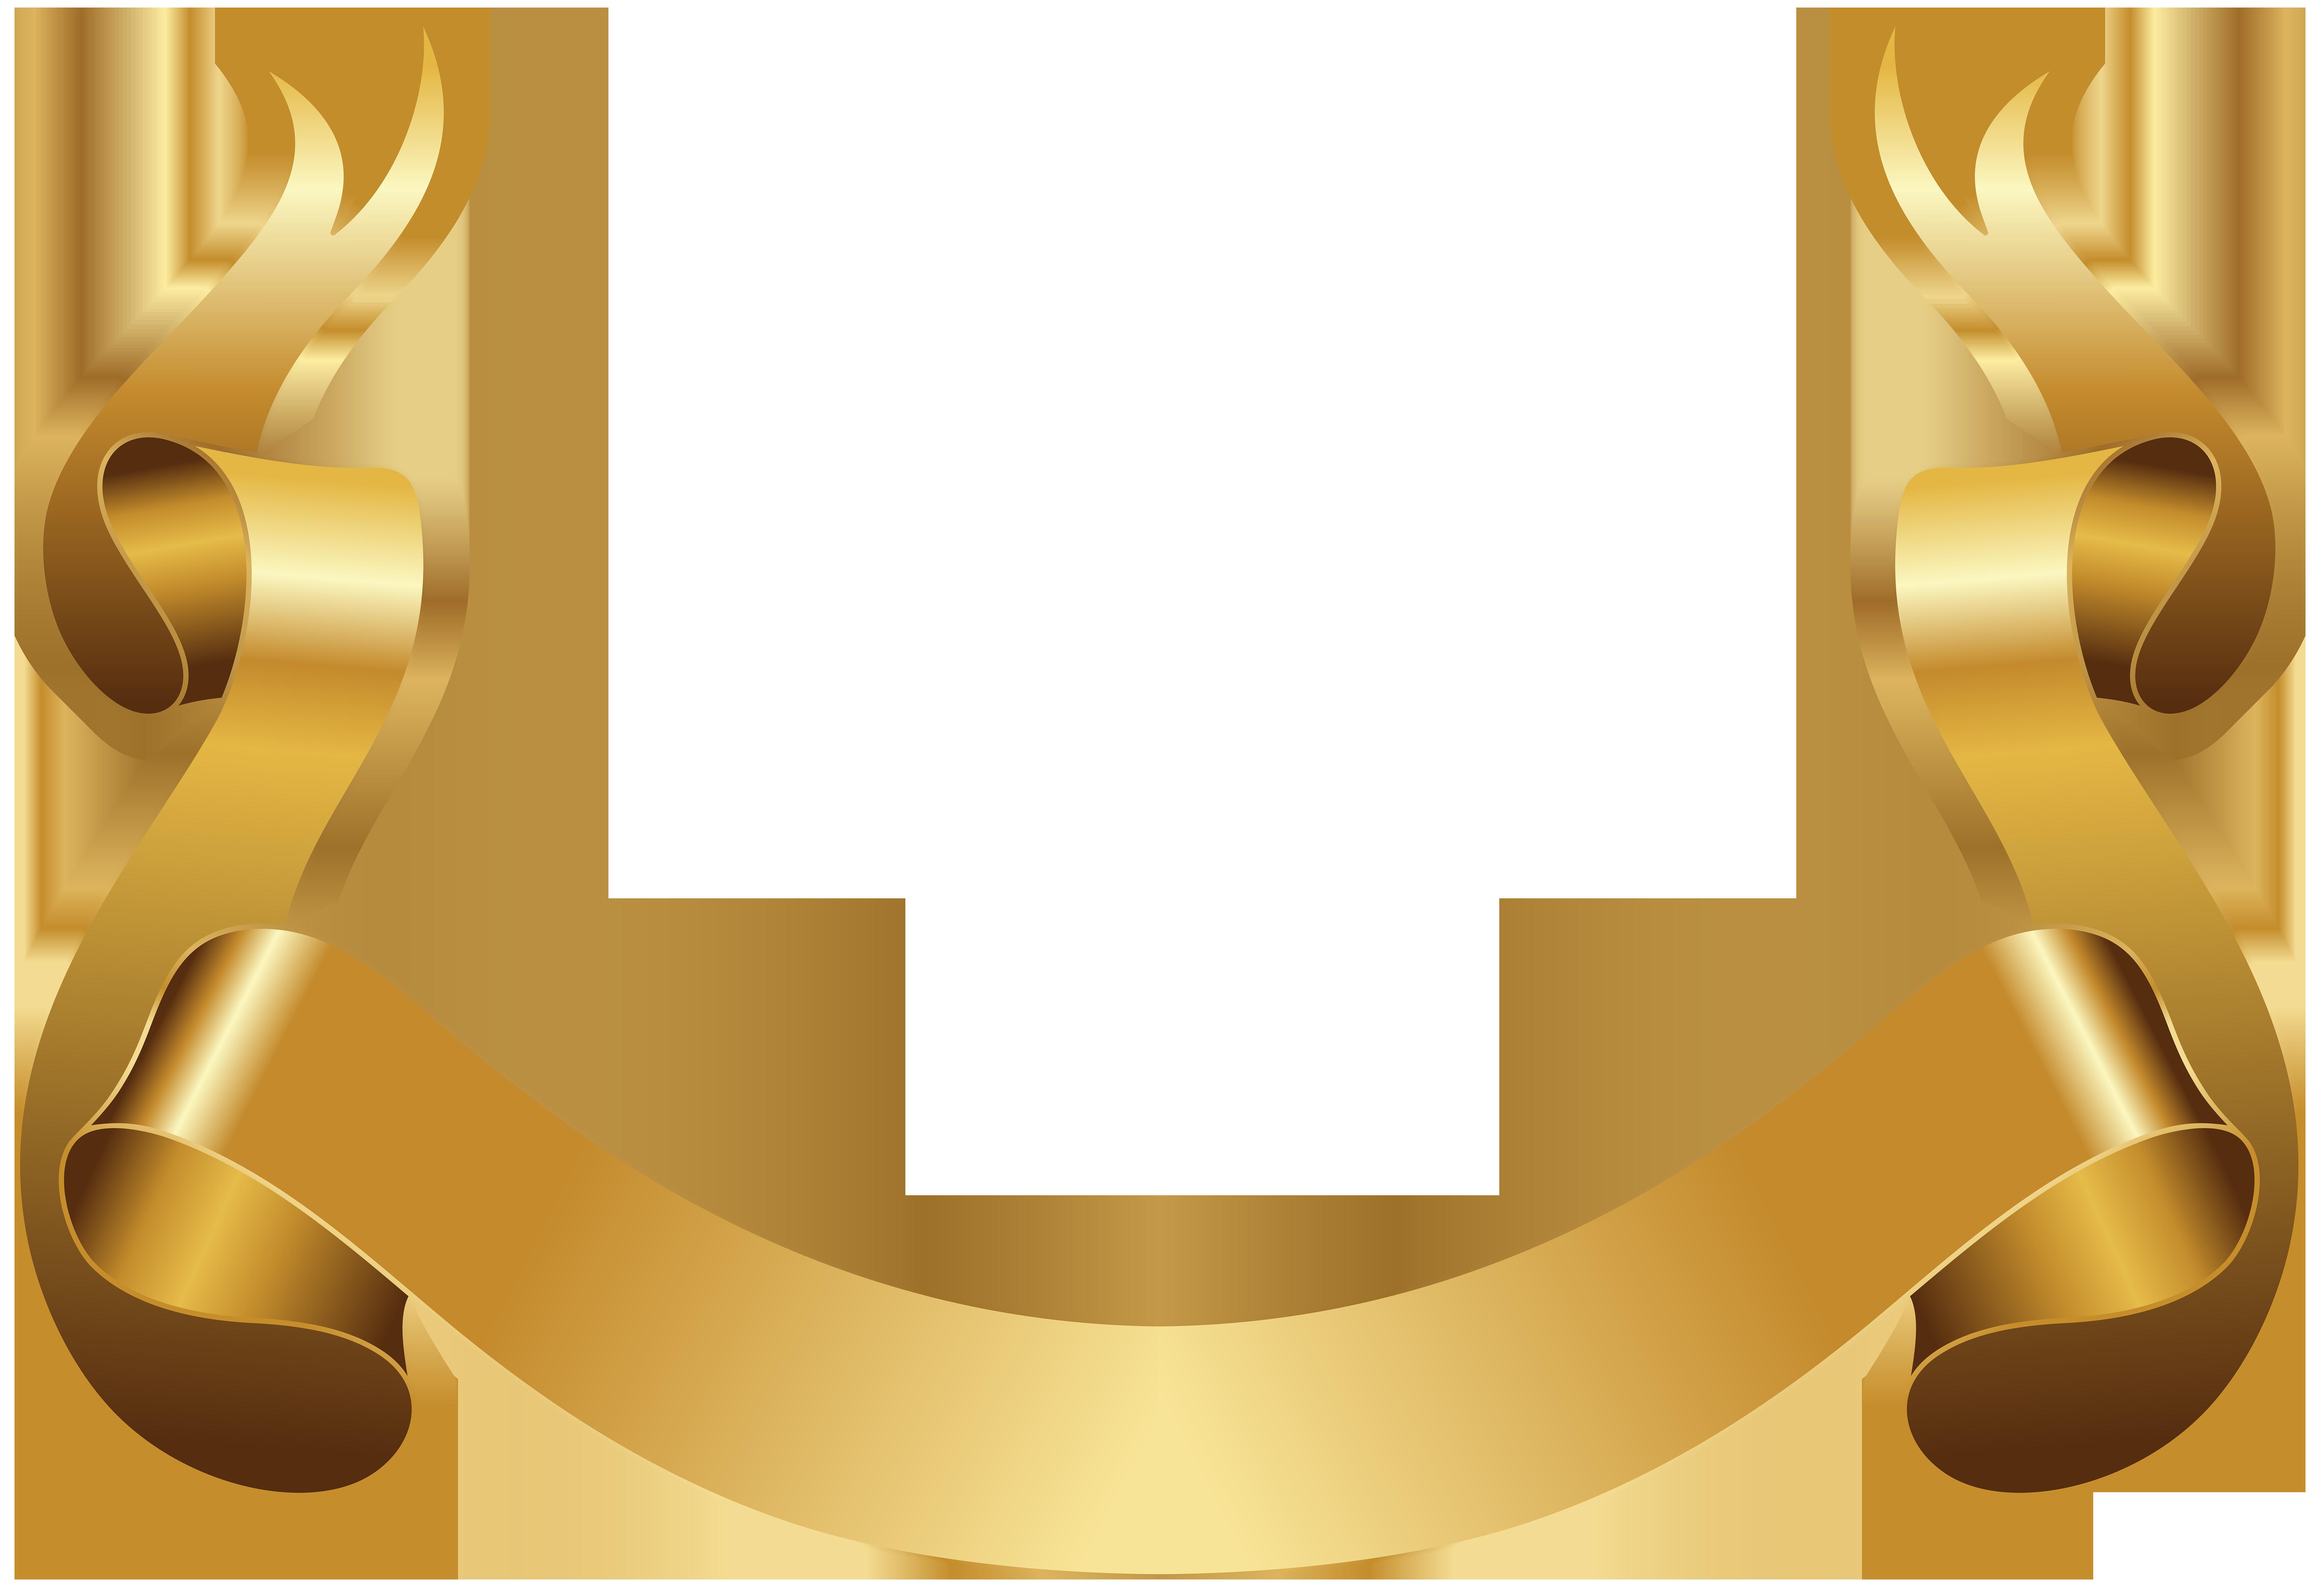 Grain clipart circle. Banner gold decorative clip